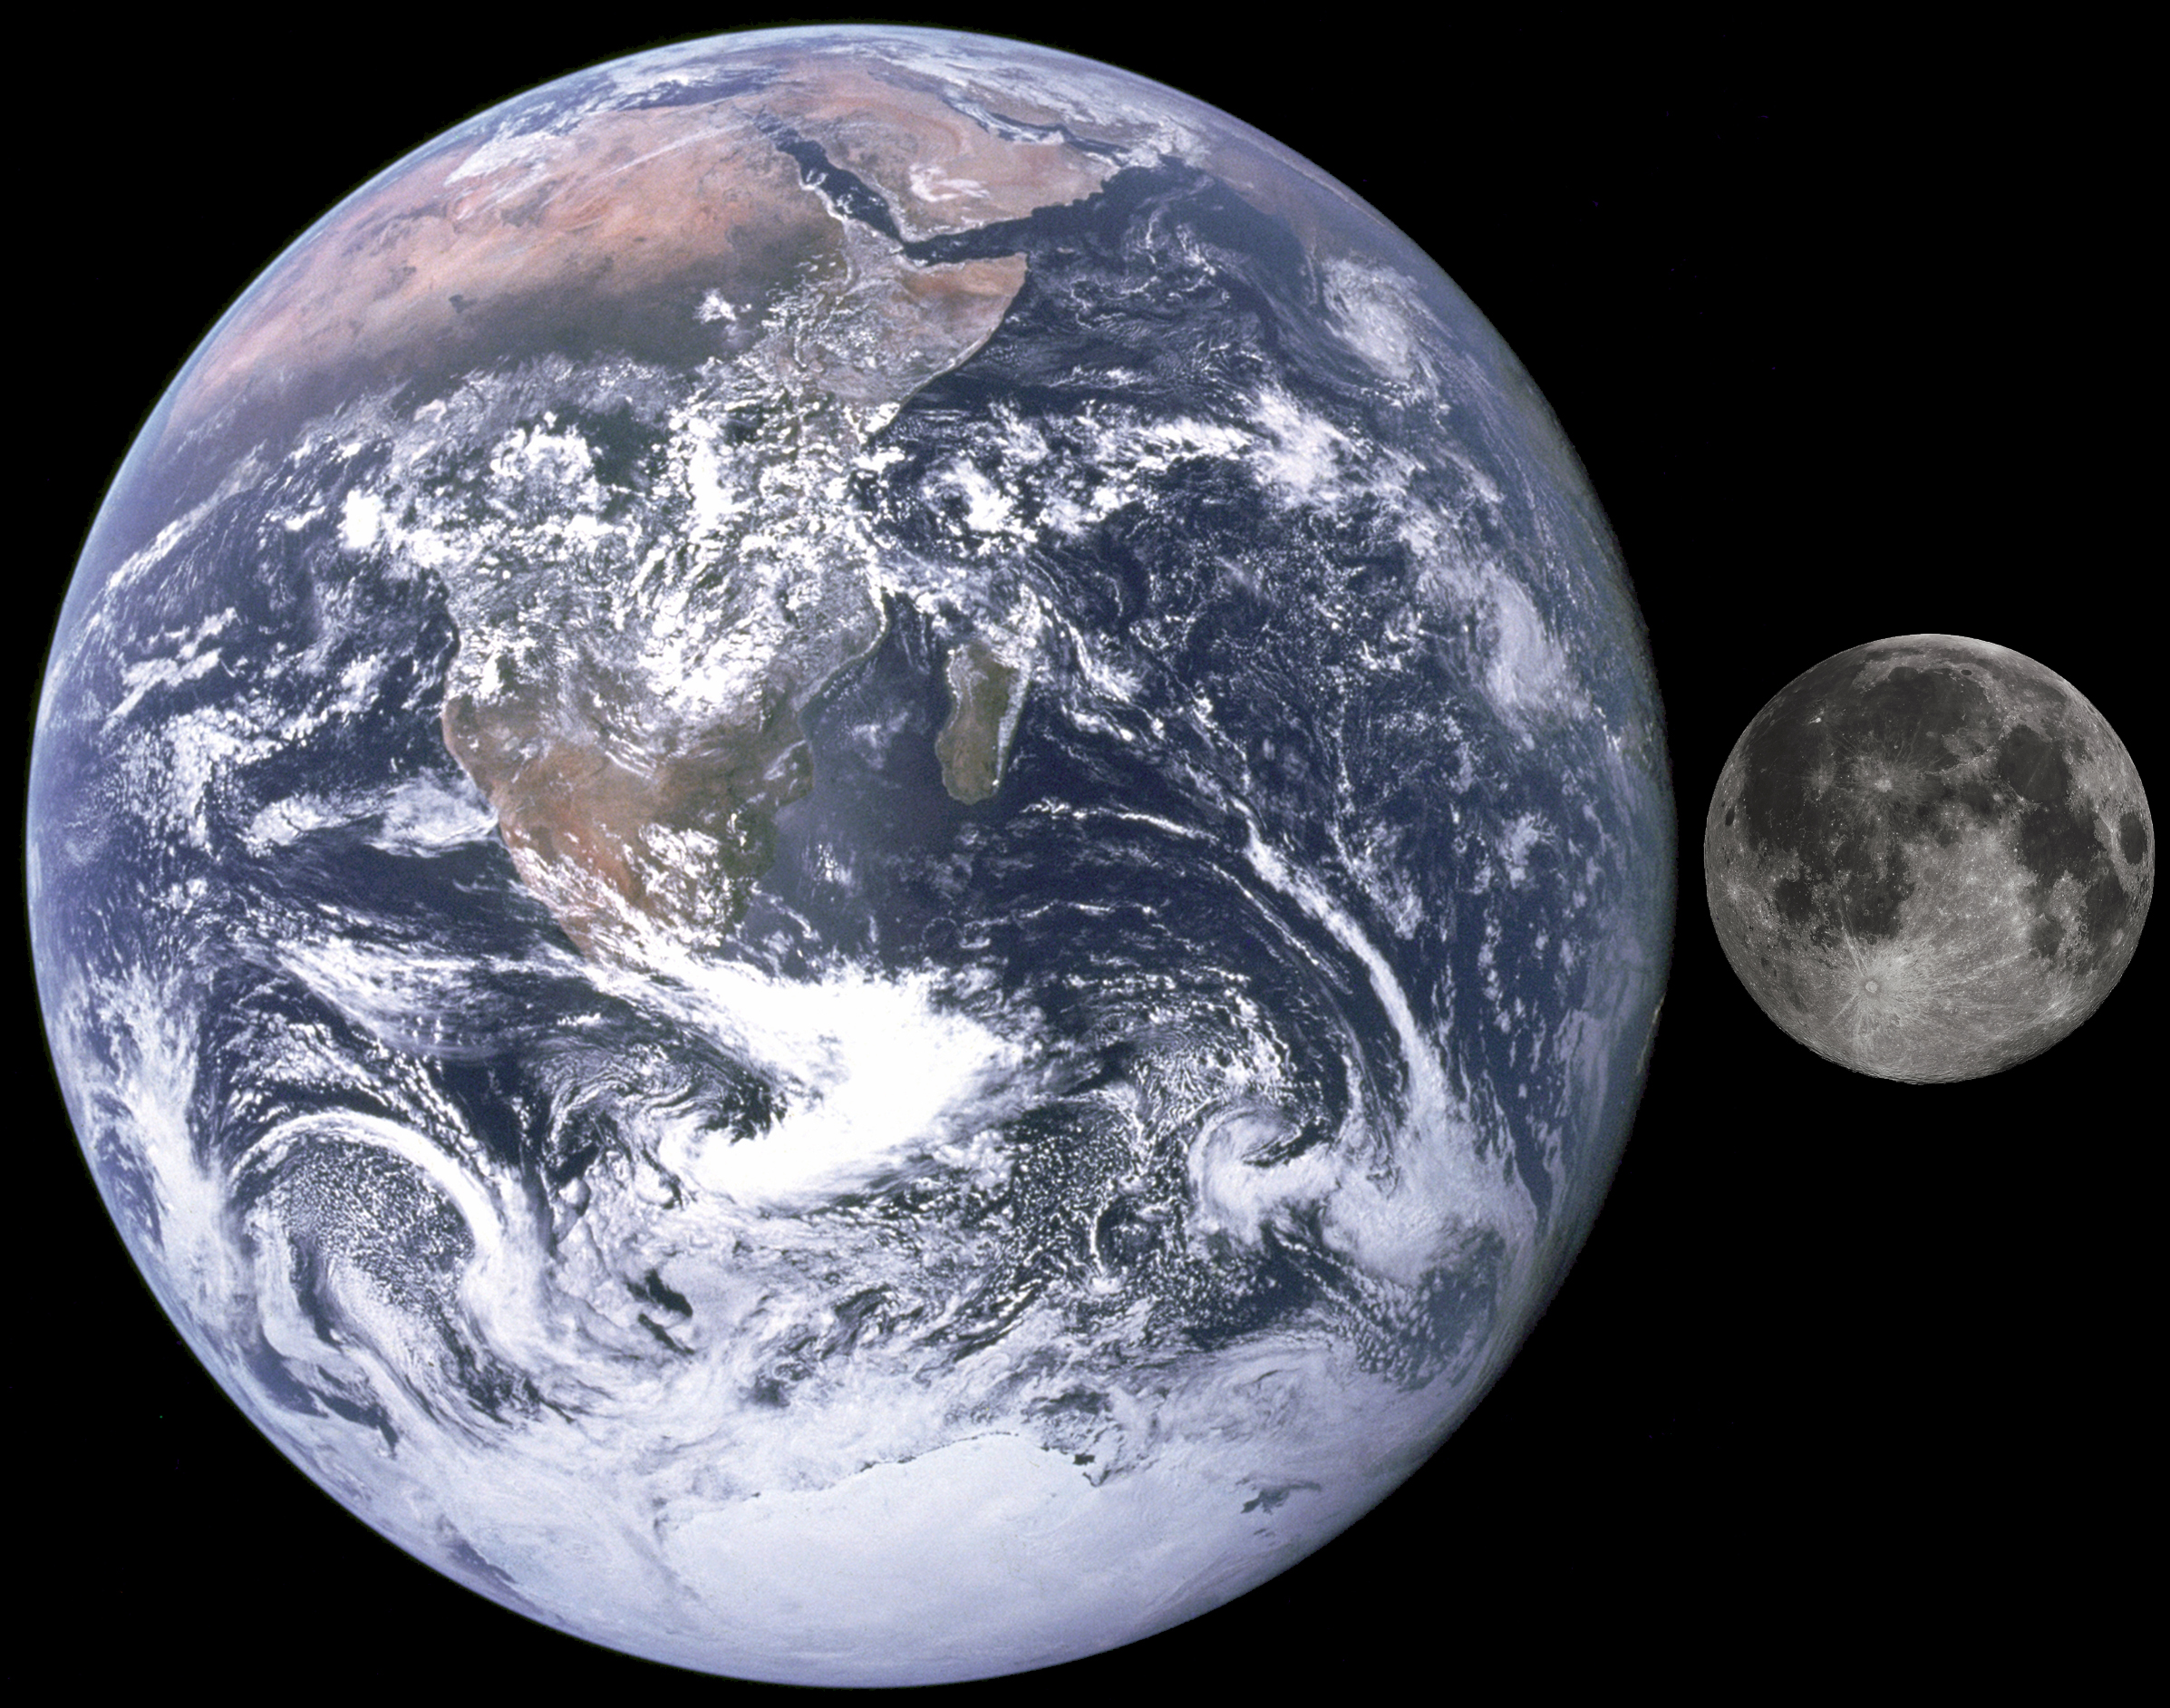 File:Moon, Earth size comparison.jpg - Wikimedia Commons